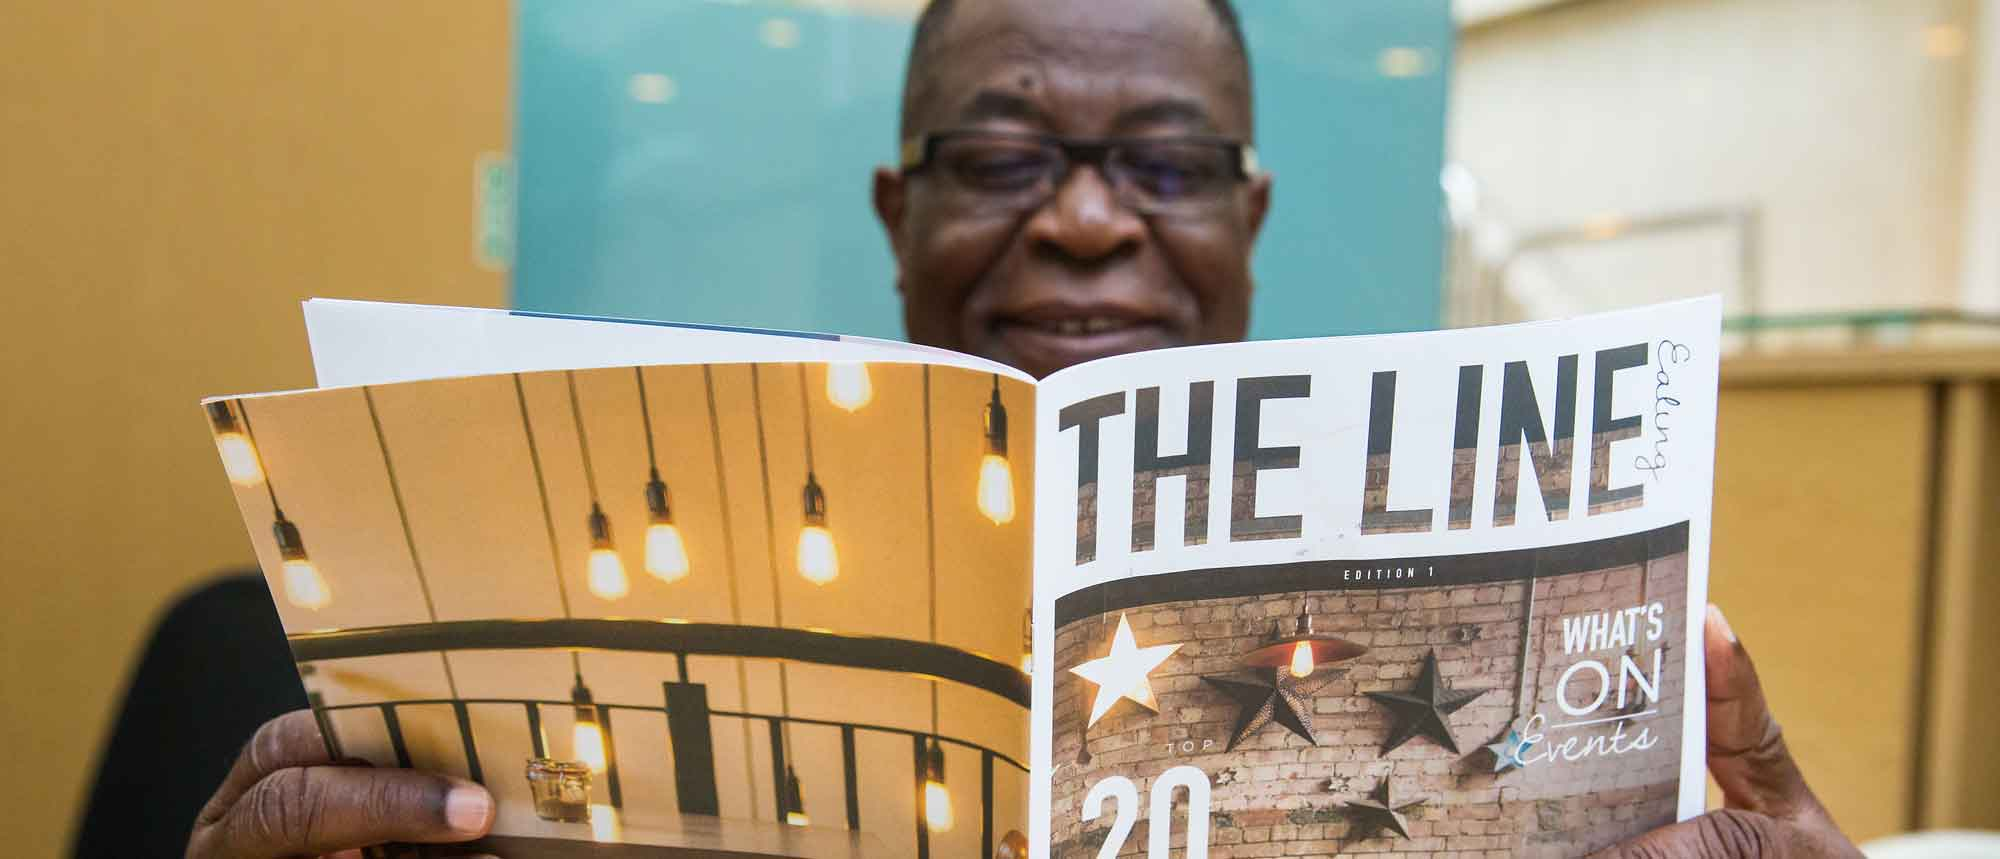 Man reading The Line magazine